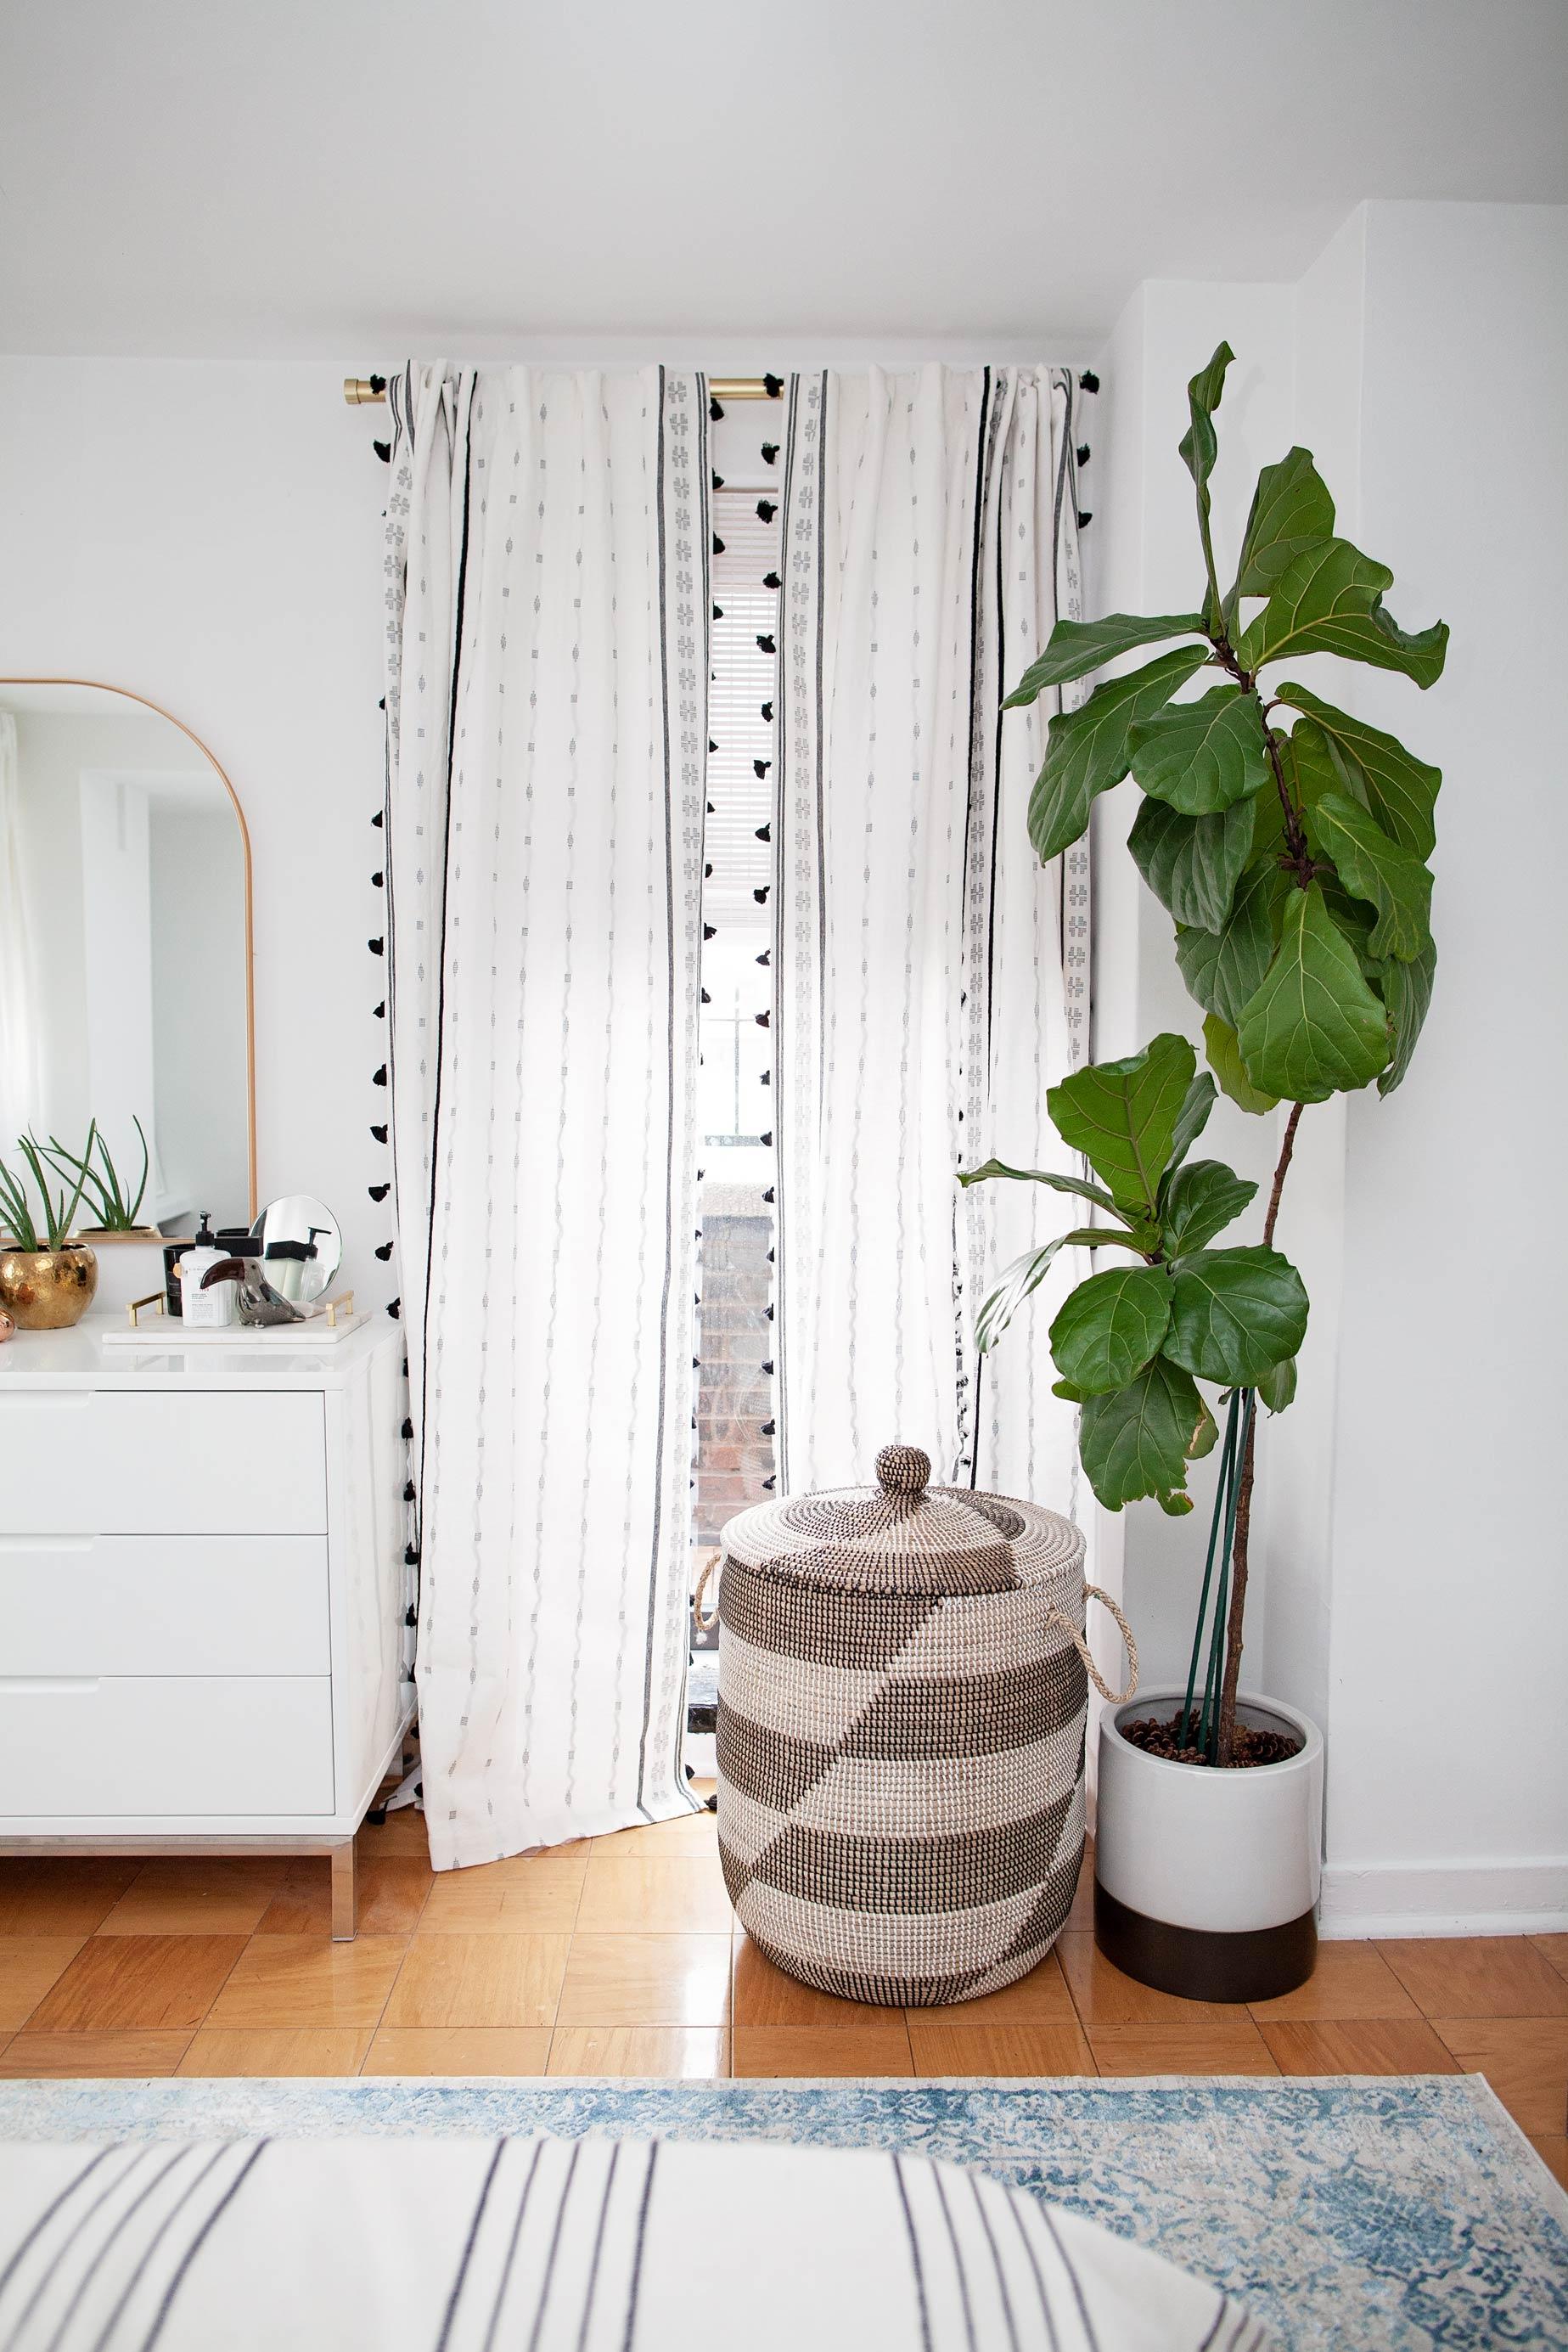 February Bedroom Home Decor Rug Pillows Throws West Elm Cb2 2